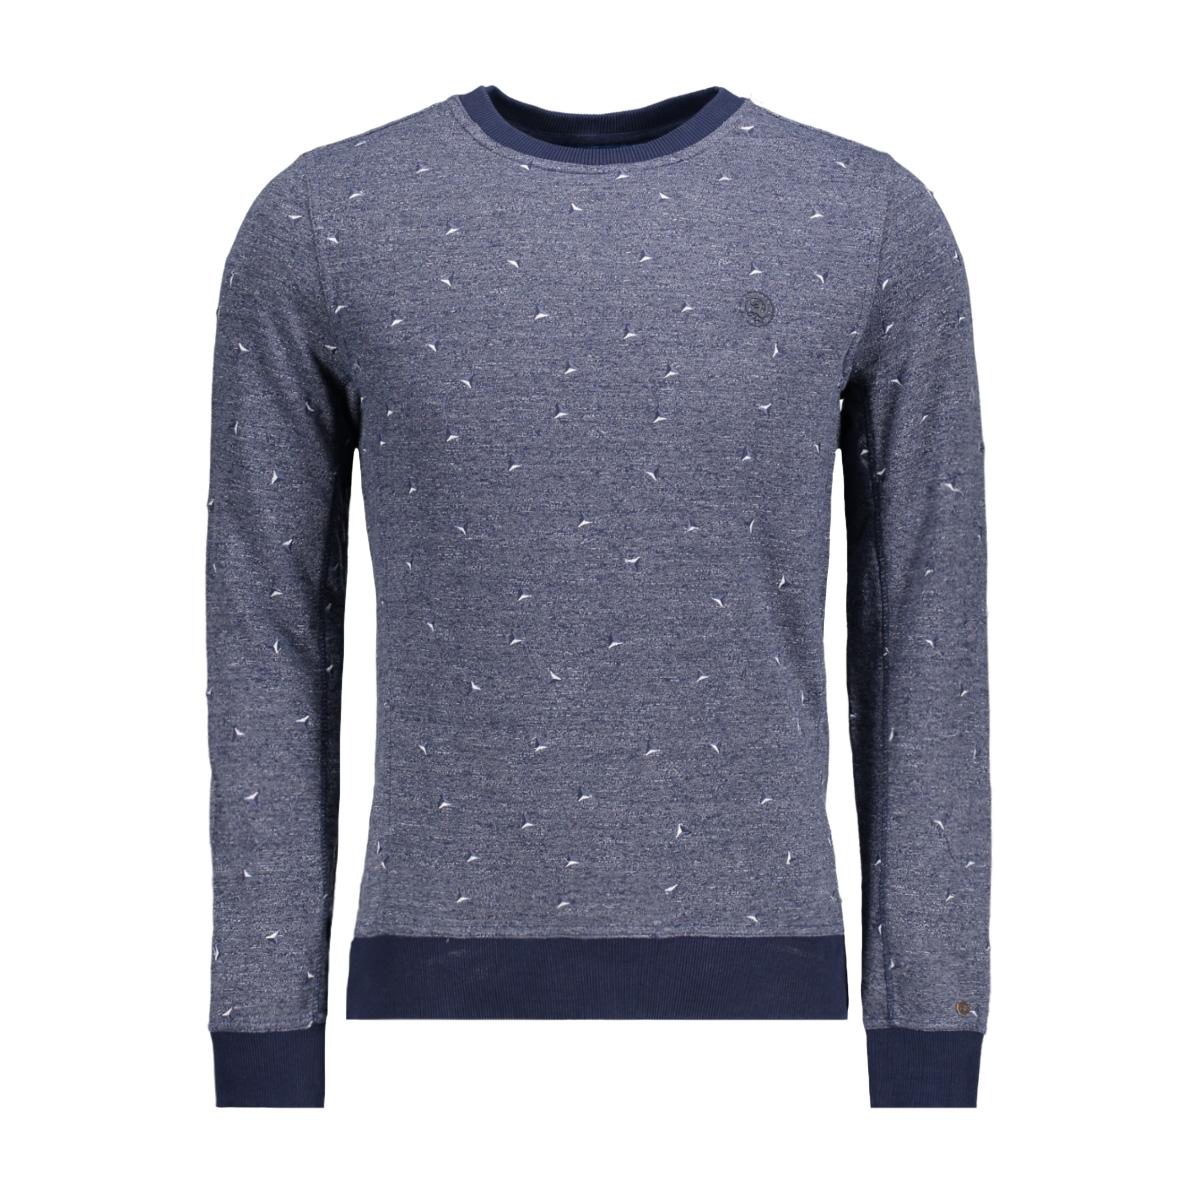 csw186001 cast iron sweater 5287